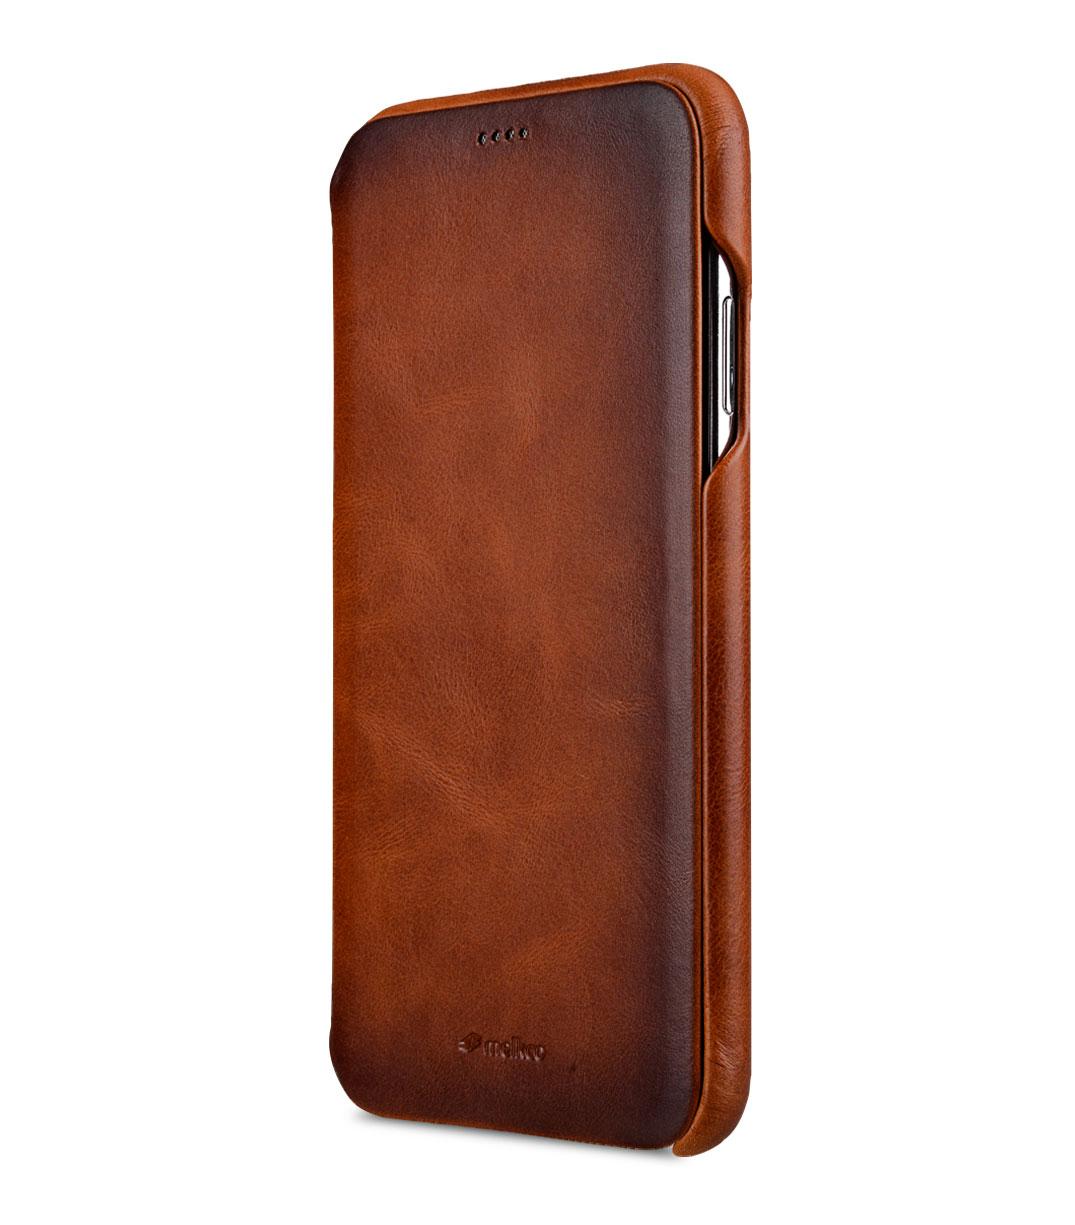 "Melkco Elite Series Premium Leather Face Cover Back Slot Case for Apple iPhone XS Max (6.5"") - ( Tan )"